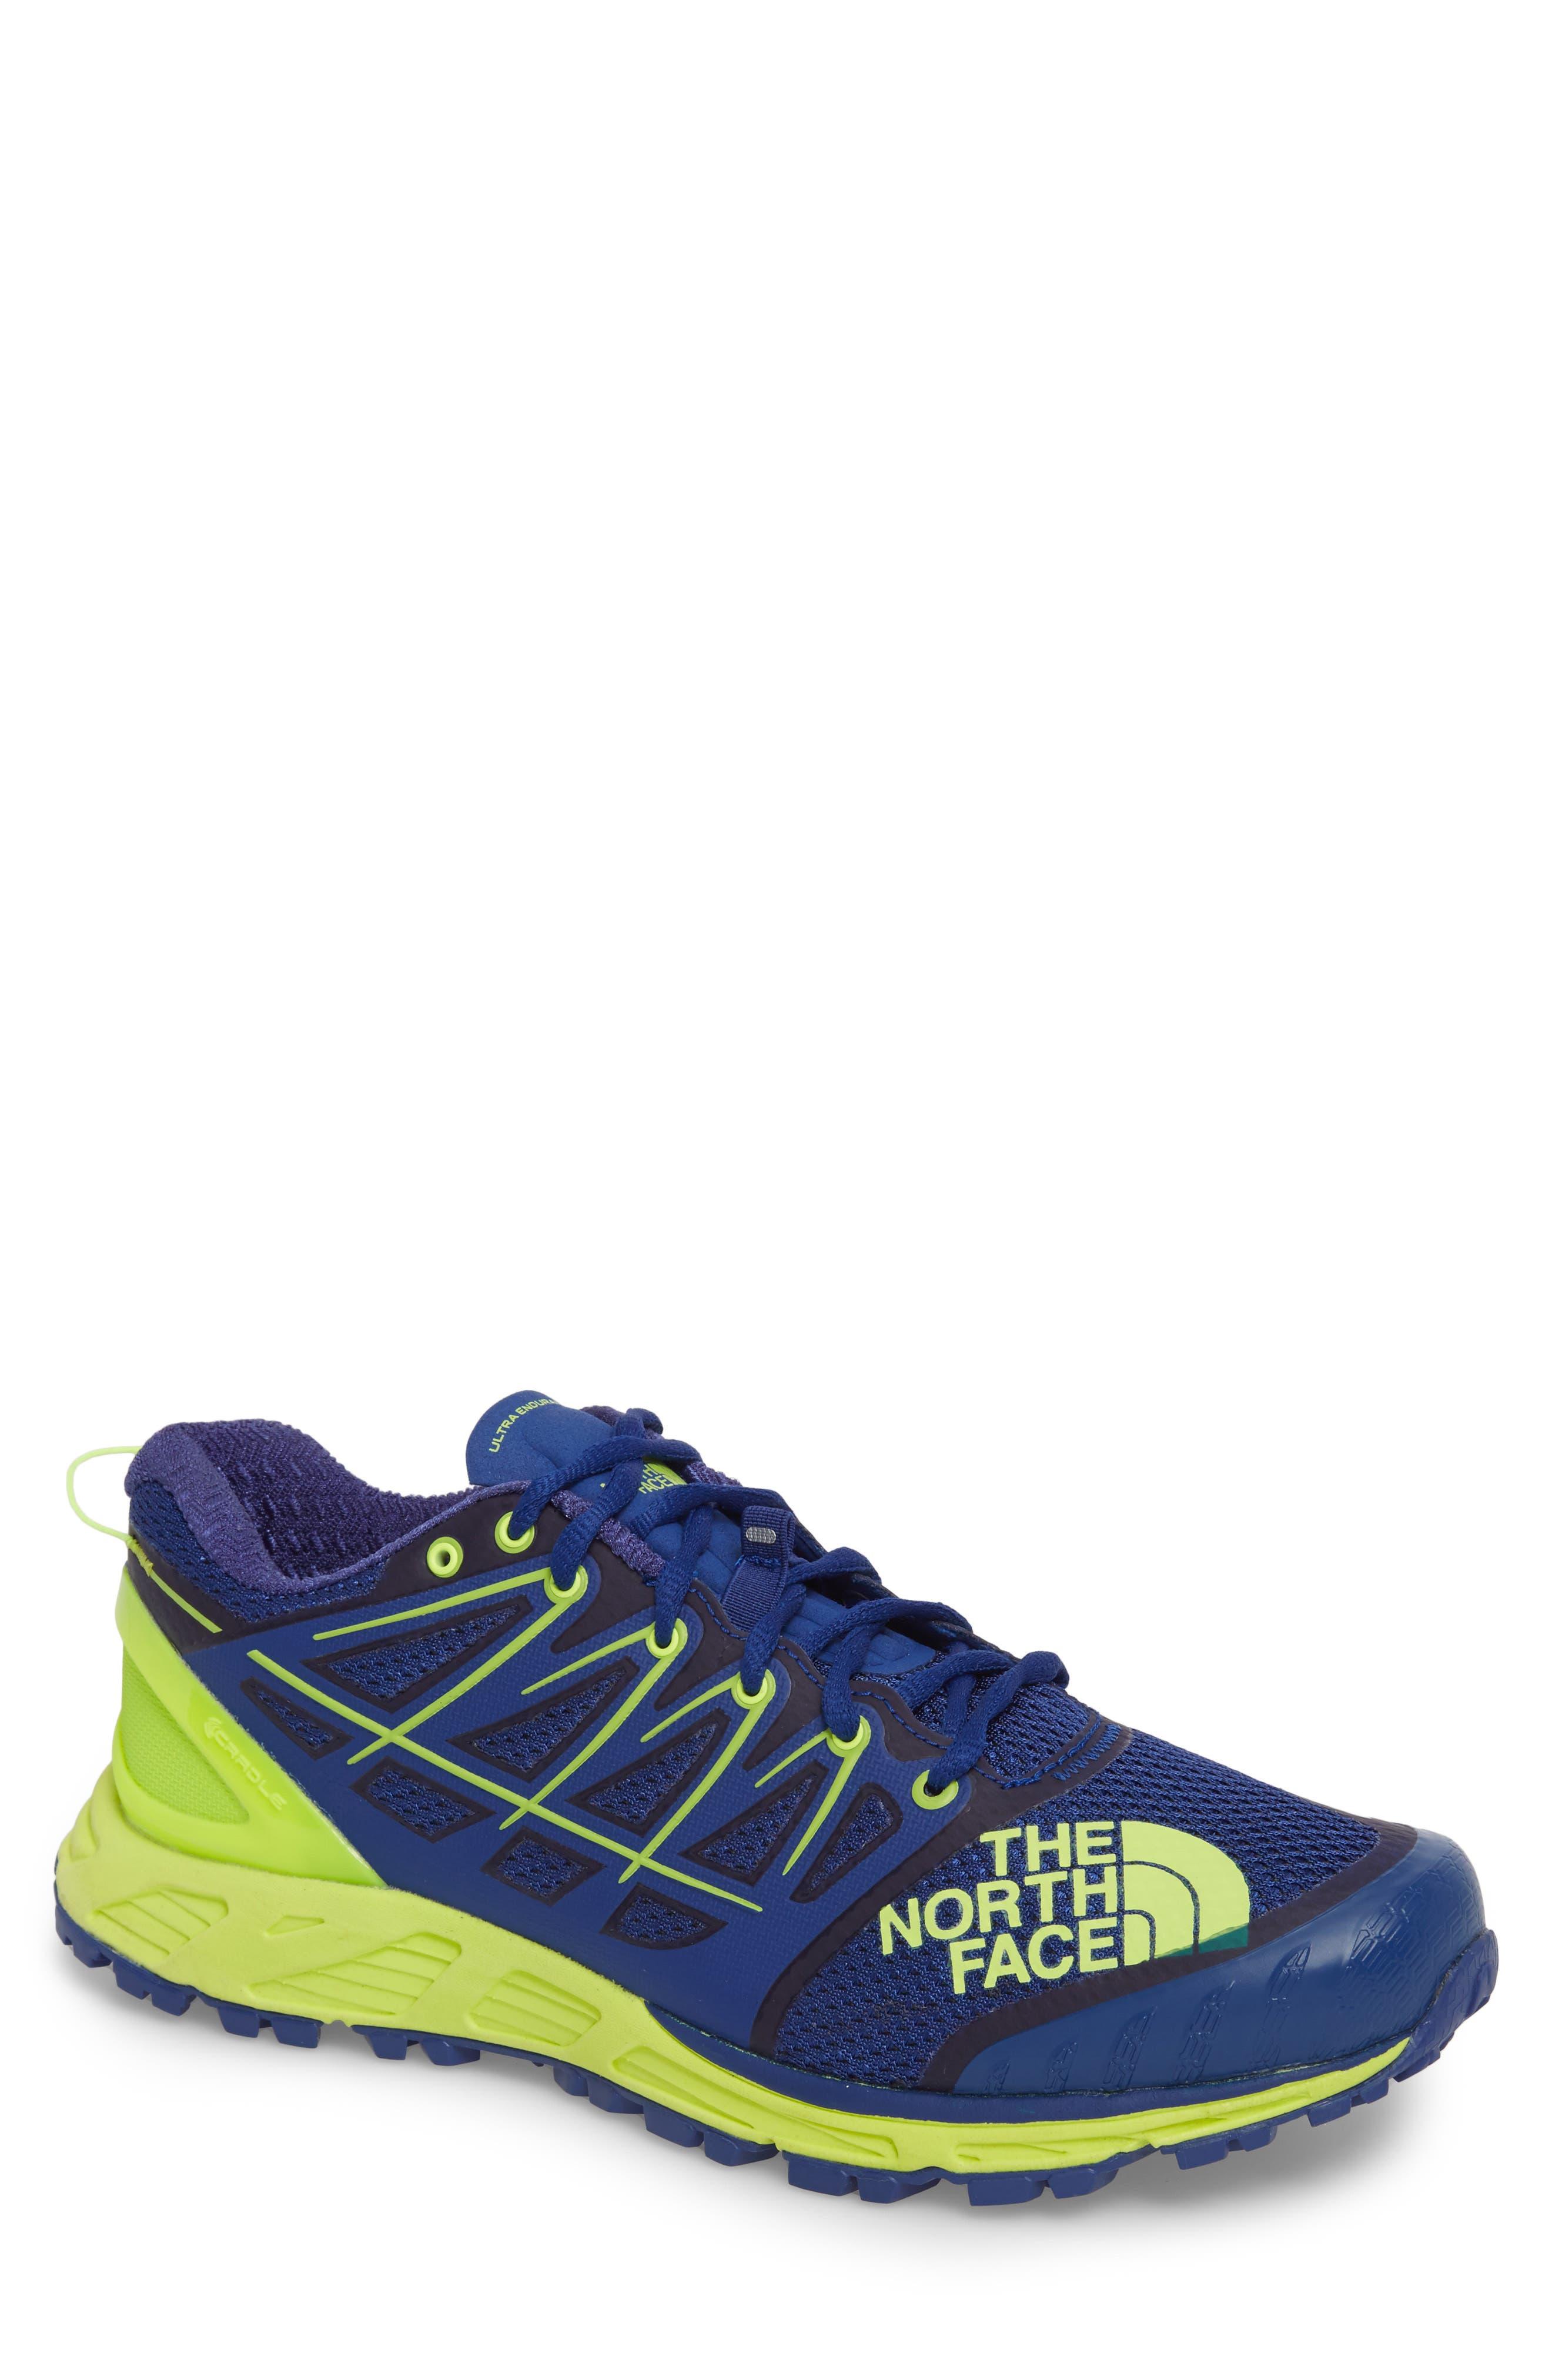 Ultra Endurance II Trail Running Shoe,                         Main,                         color, Brit Blue/ Dayglo Yellow